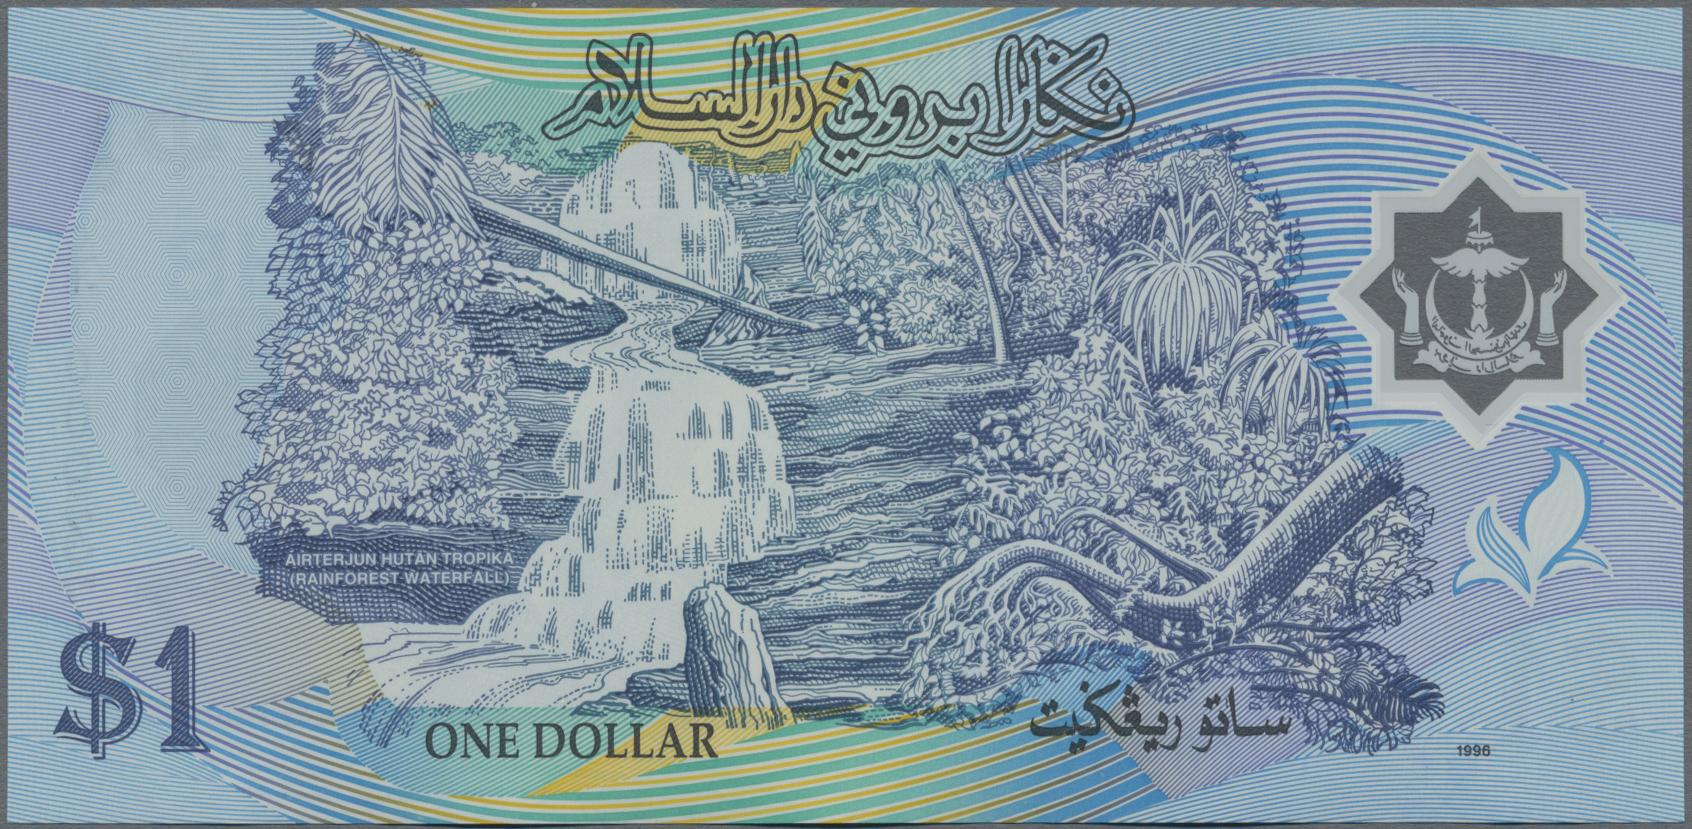 Lot 00085 - Brunei | Banknoten  -  Auktionshaus Christoph Gärtner GmbH & Co. KG Sale #48 The Banknotes